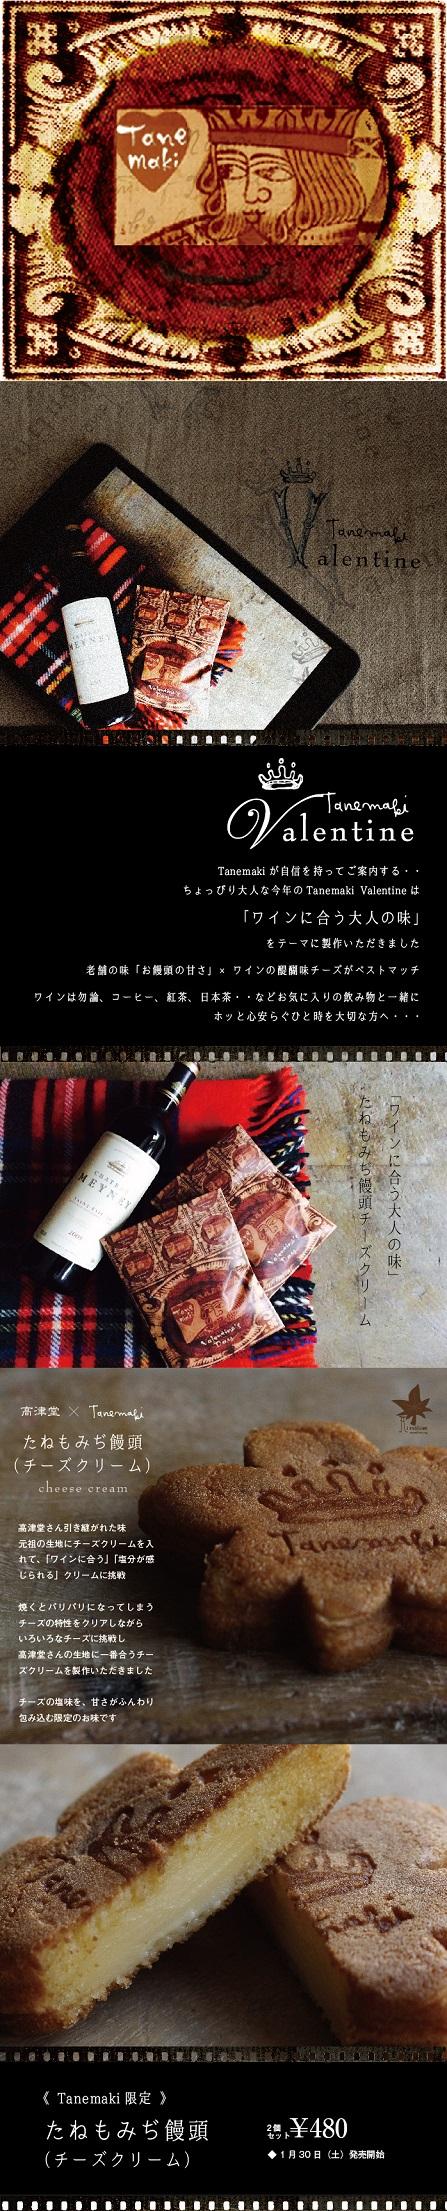 2016Tanemaki_Valetine(オリジナル).jpg